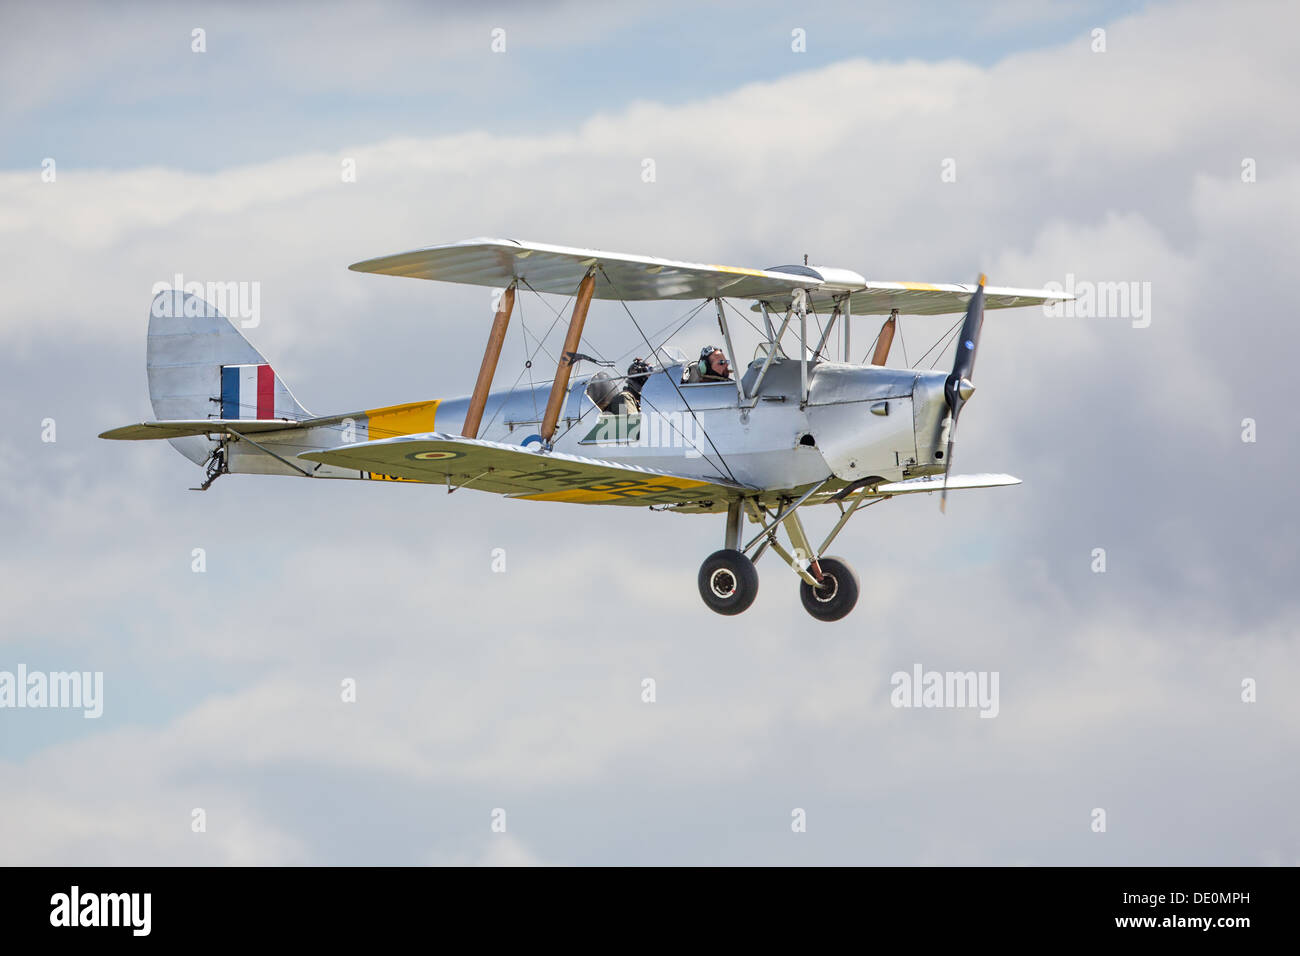 De Havilland Tiger Moth biplane in flight, side view - Stock Image